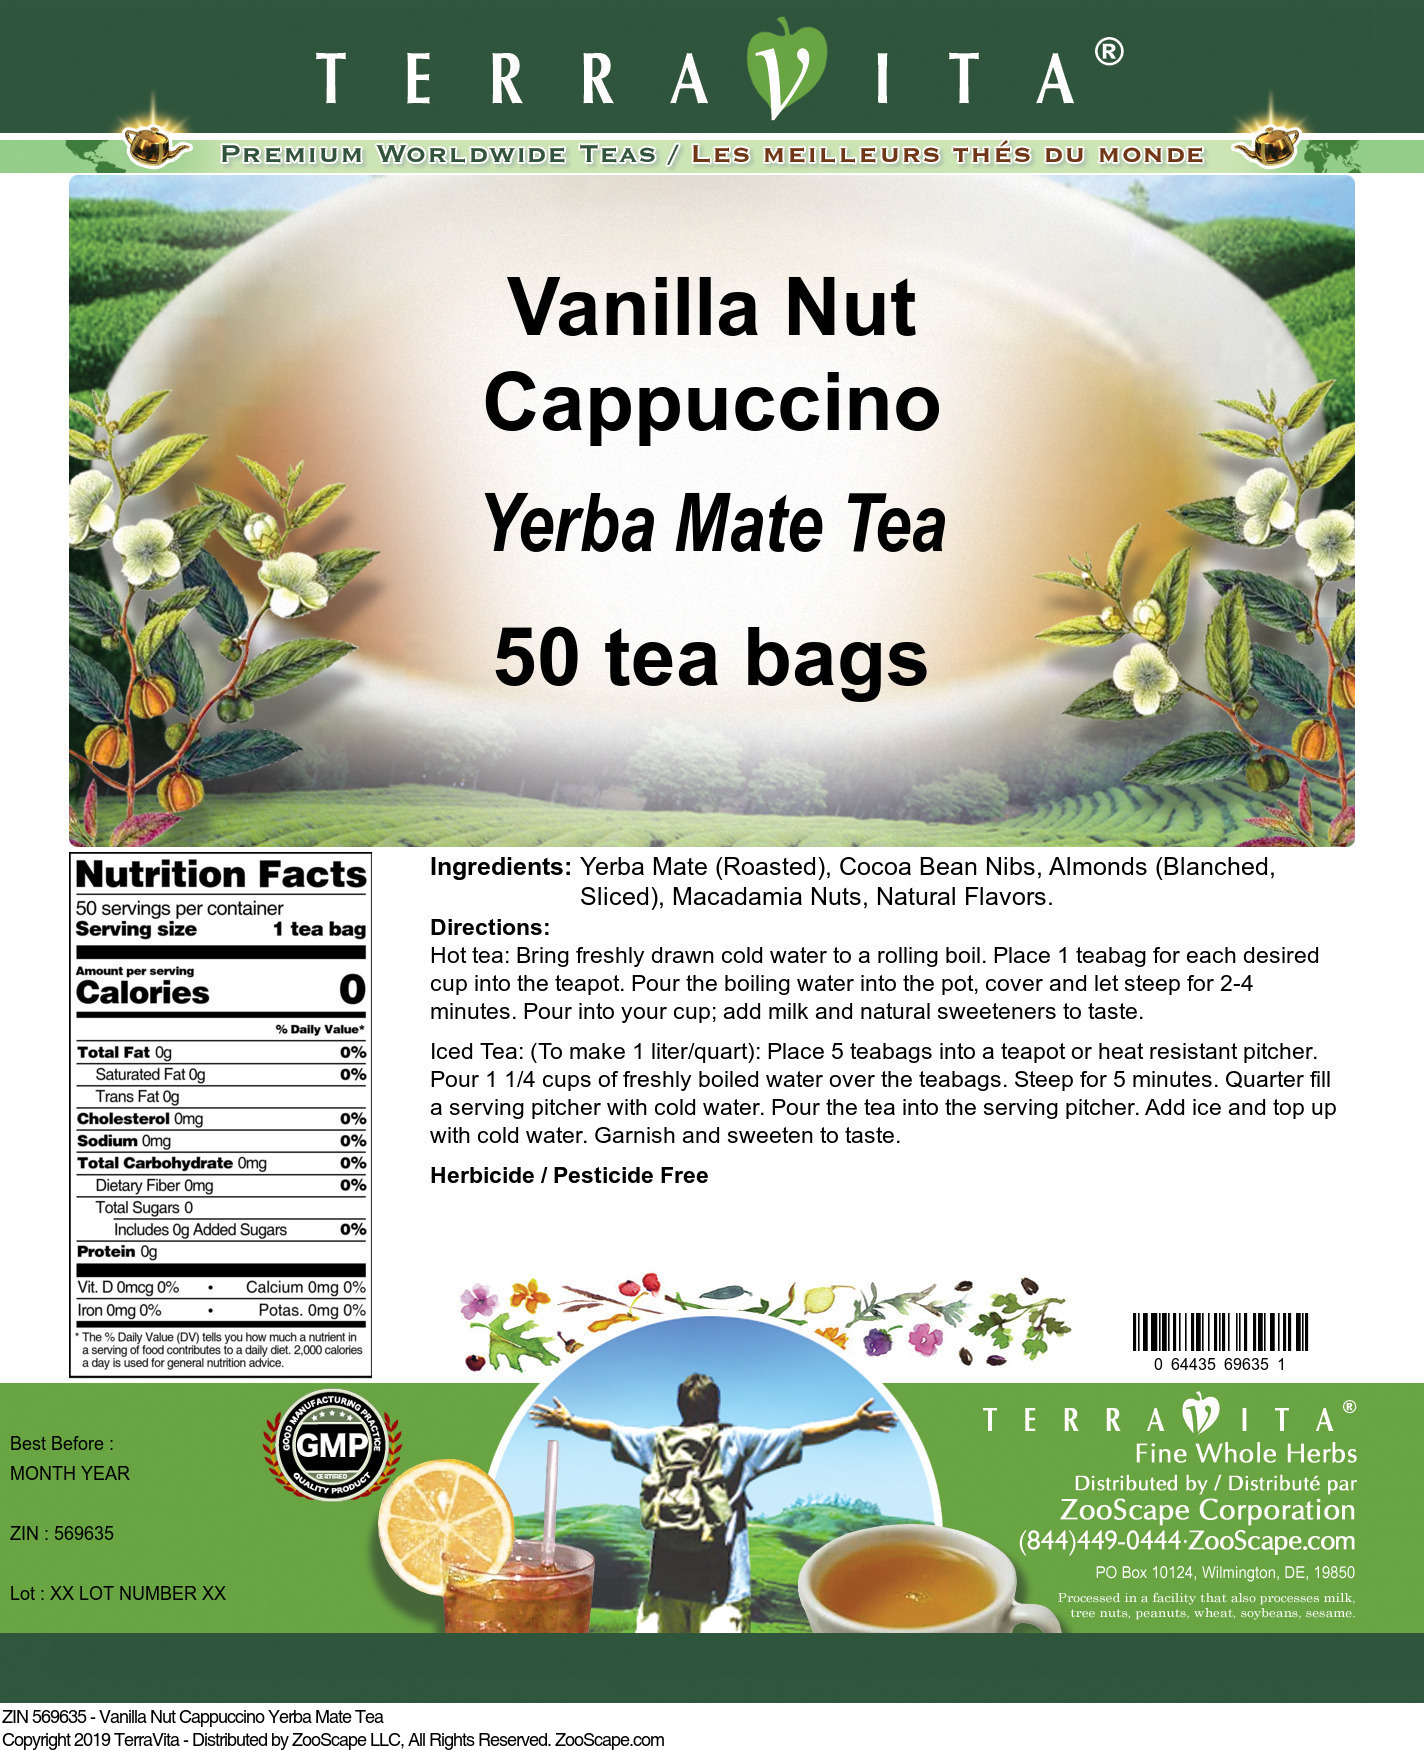 Vanilla Nut Cappuccino Yerba Mate